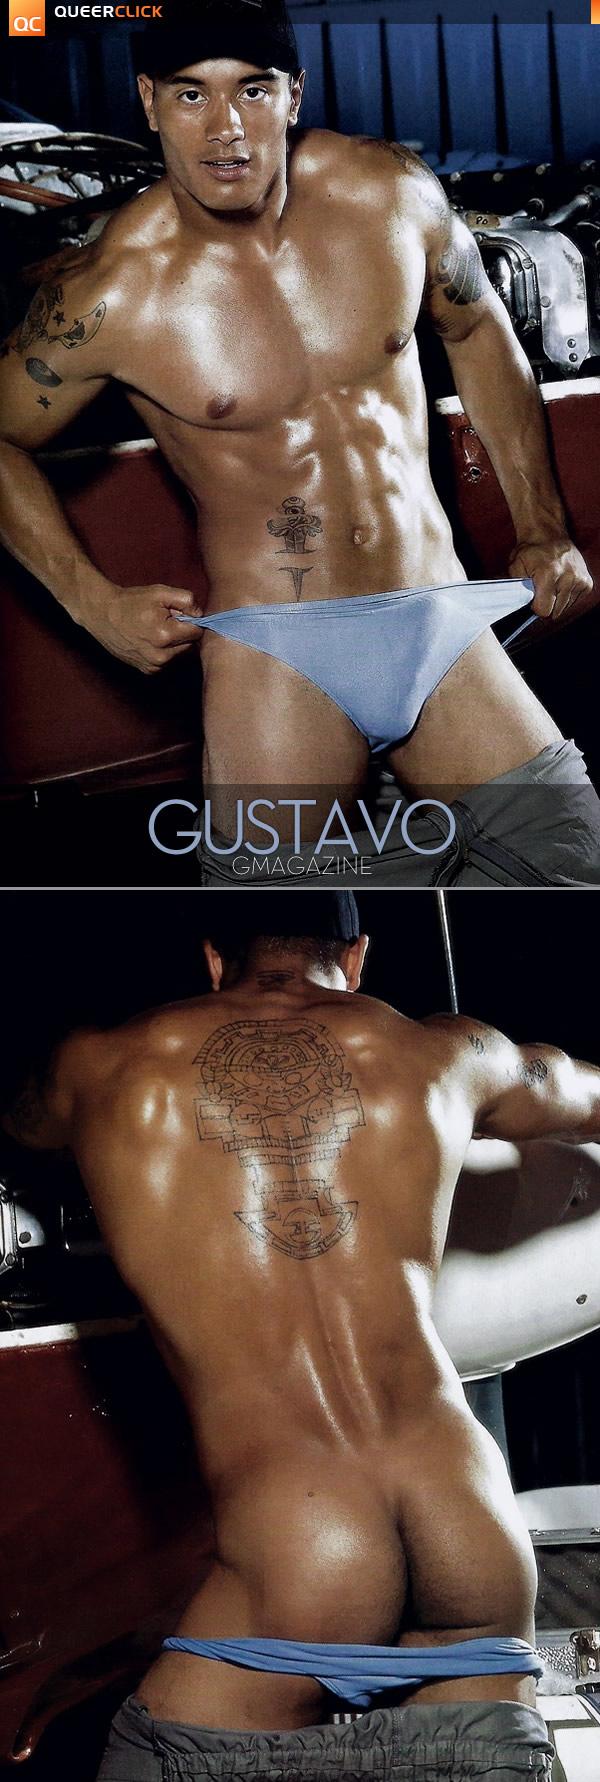 G Magazine: Gustavo